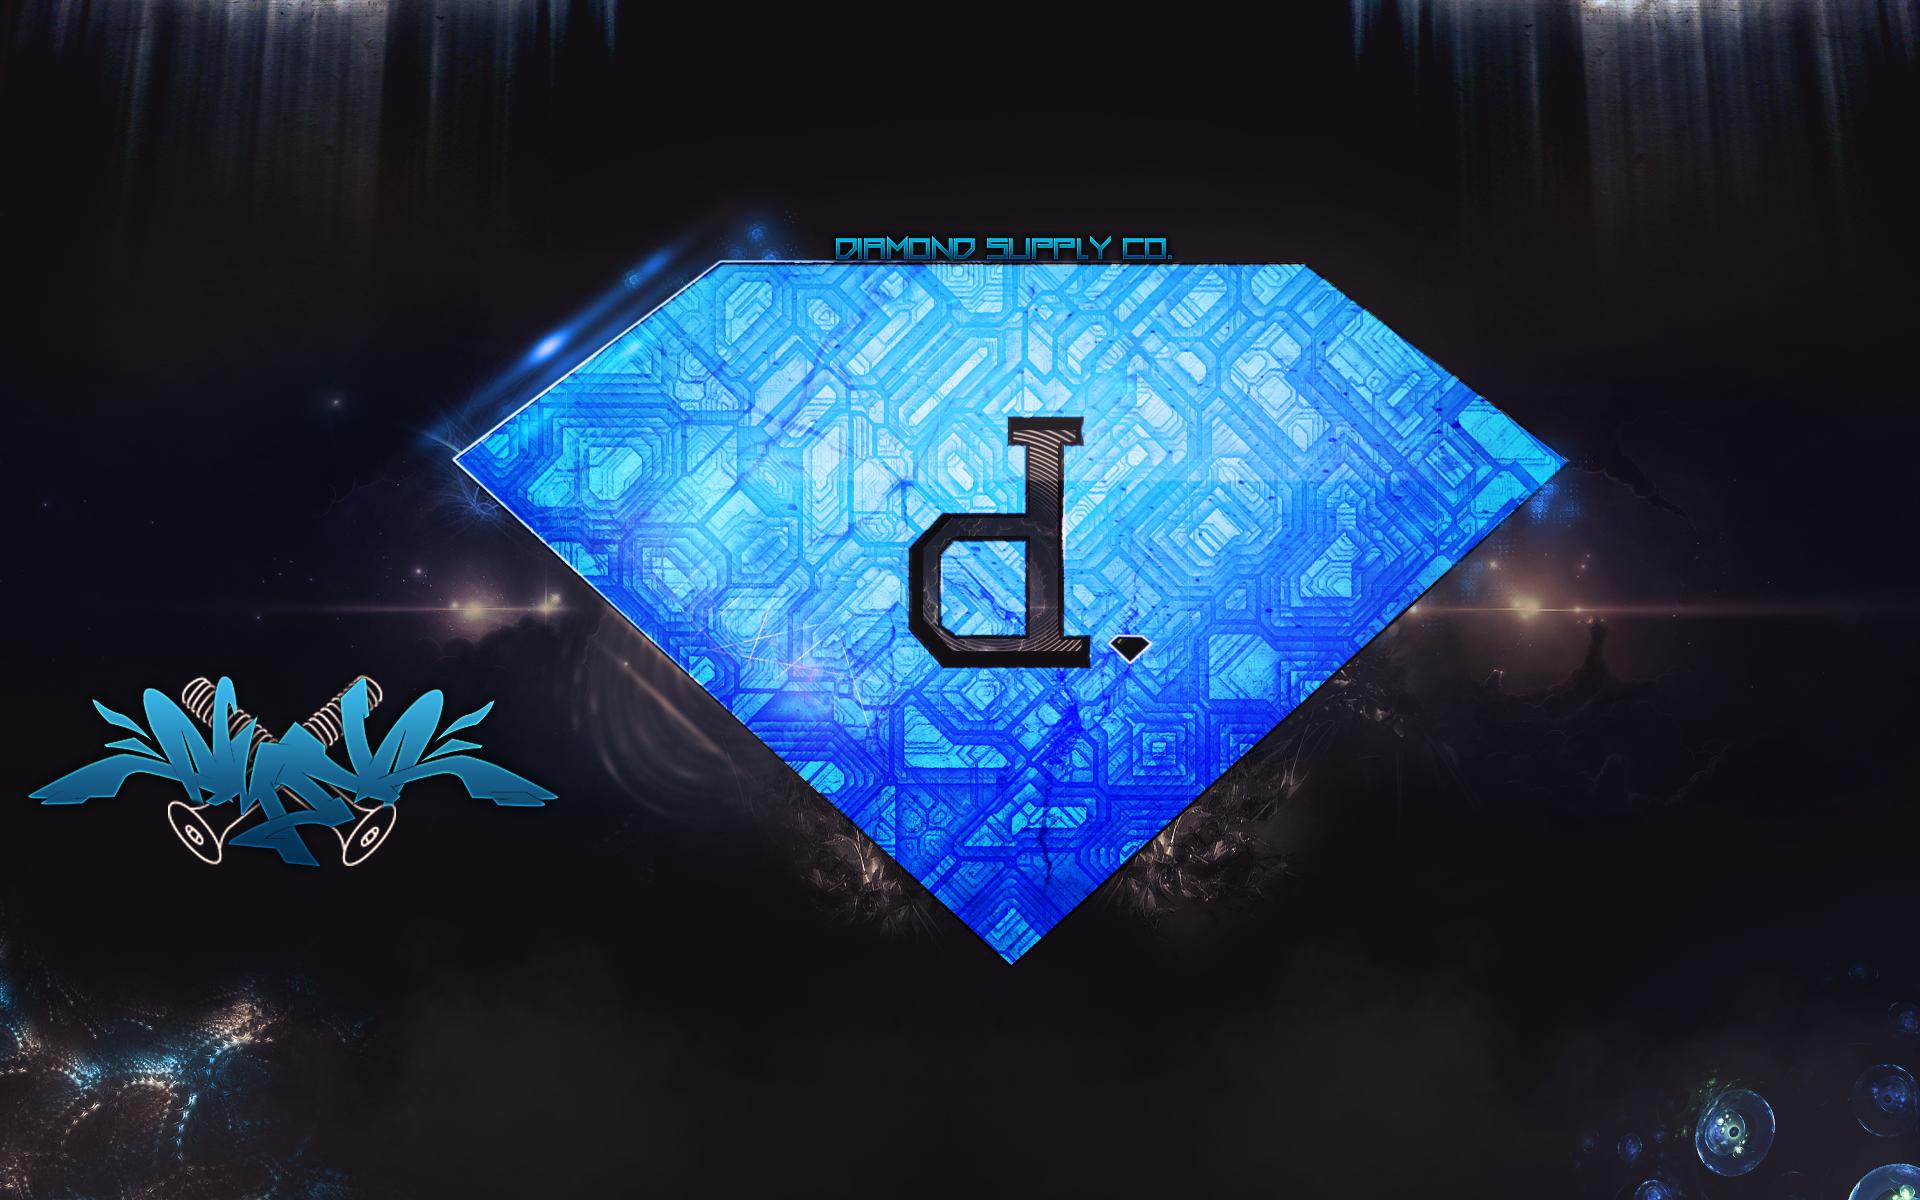 diamond logo wallpaper - photo #27